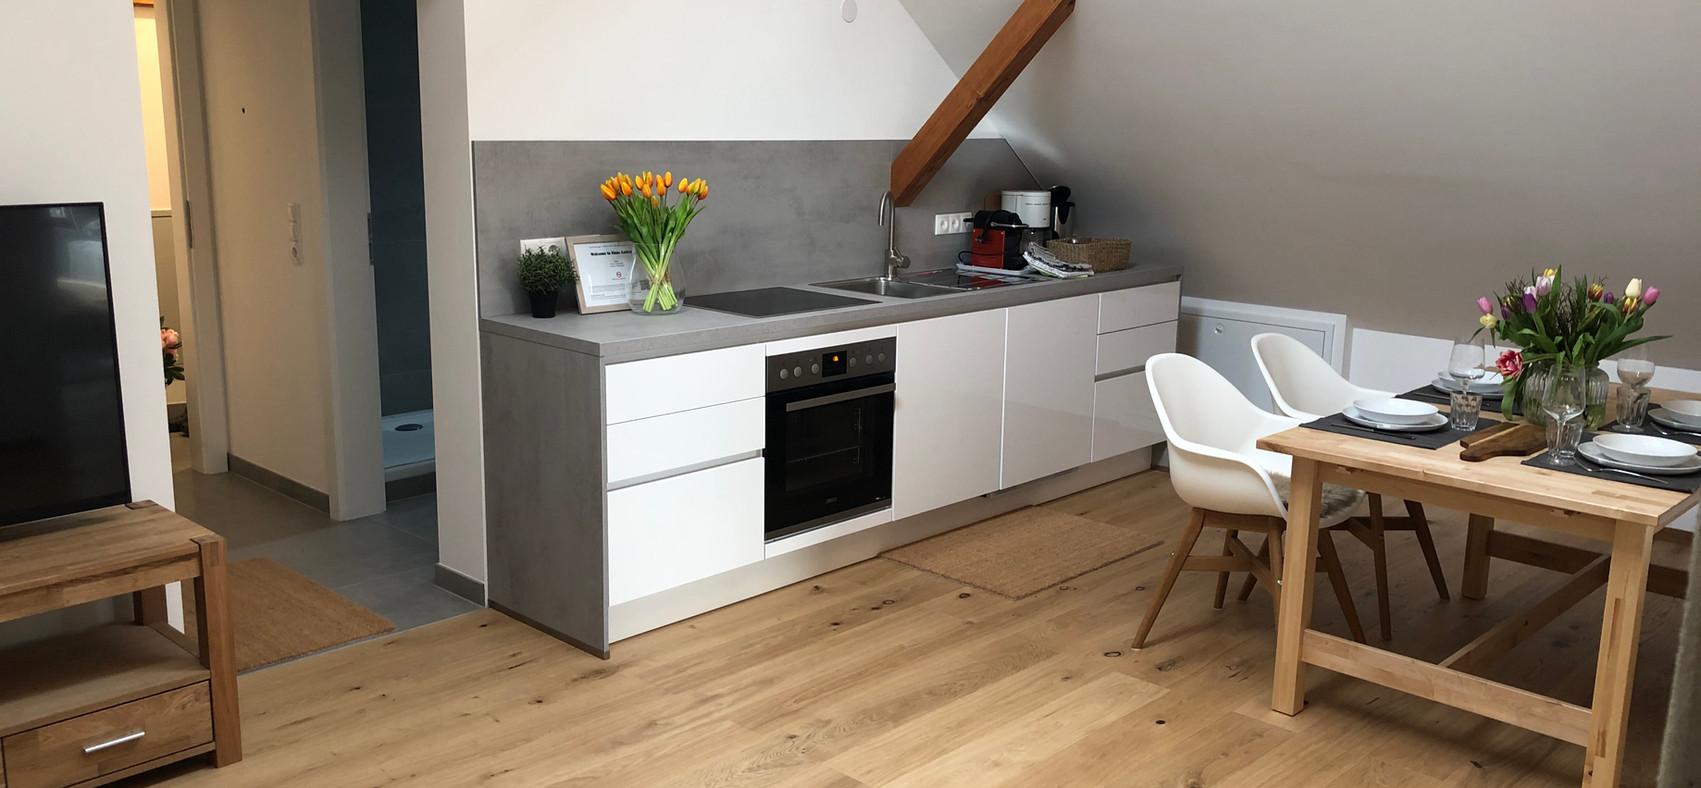 big loft - kitchen